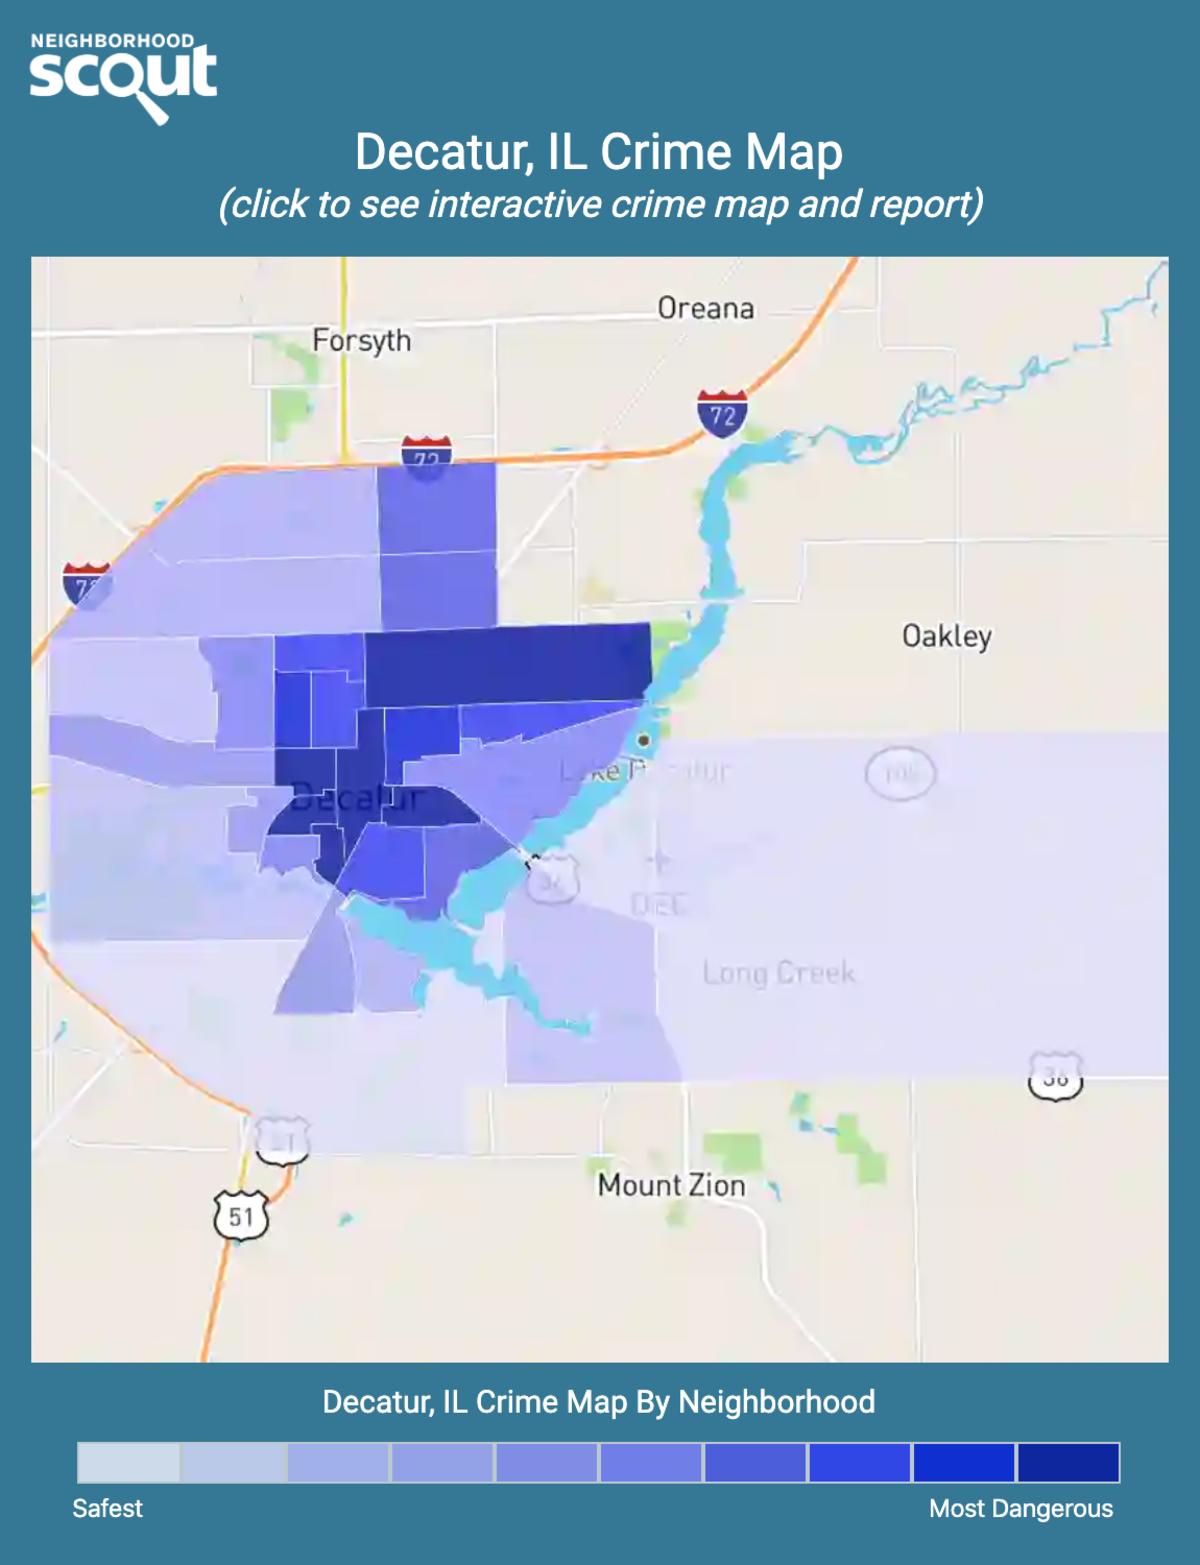 Decatur, Illinois crime map